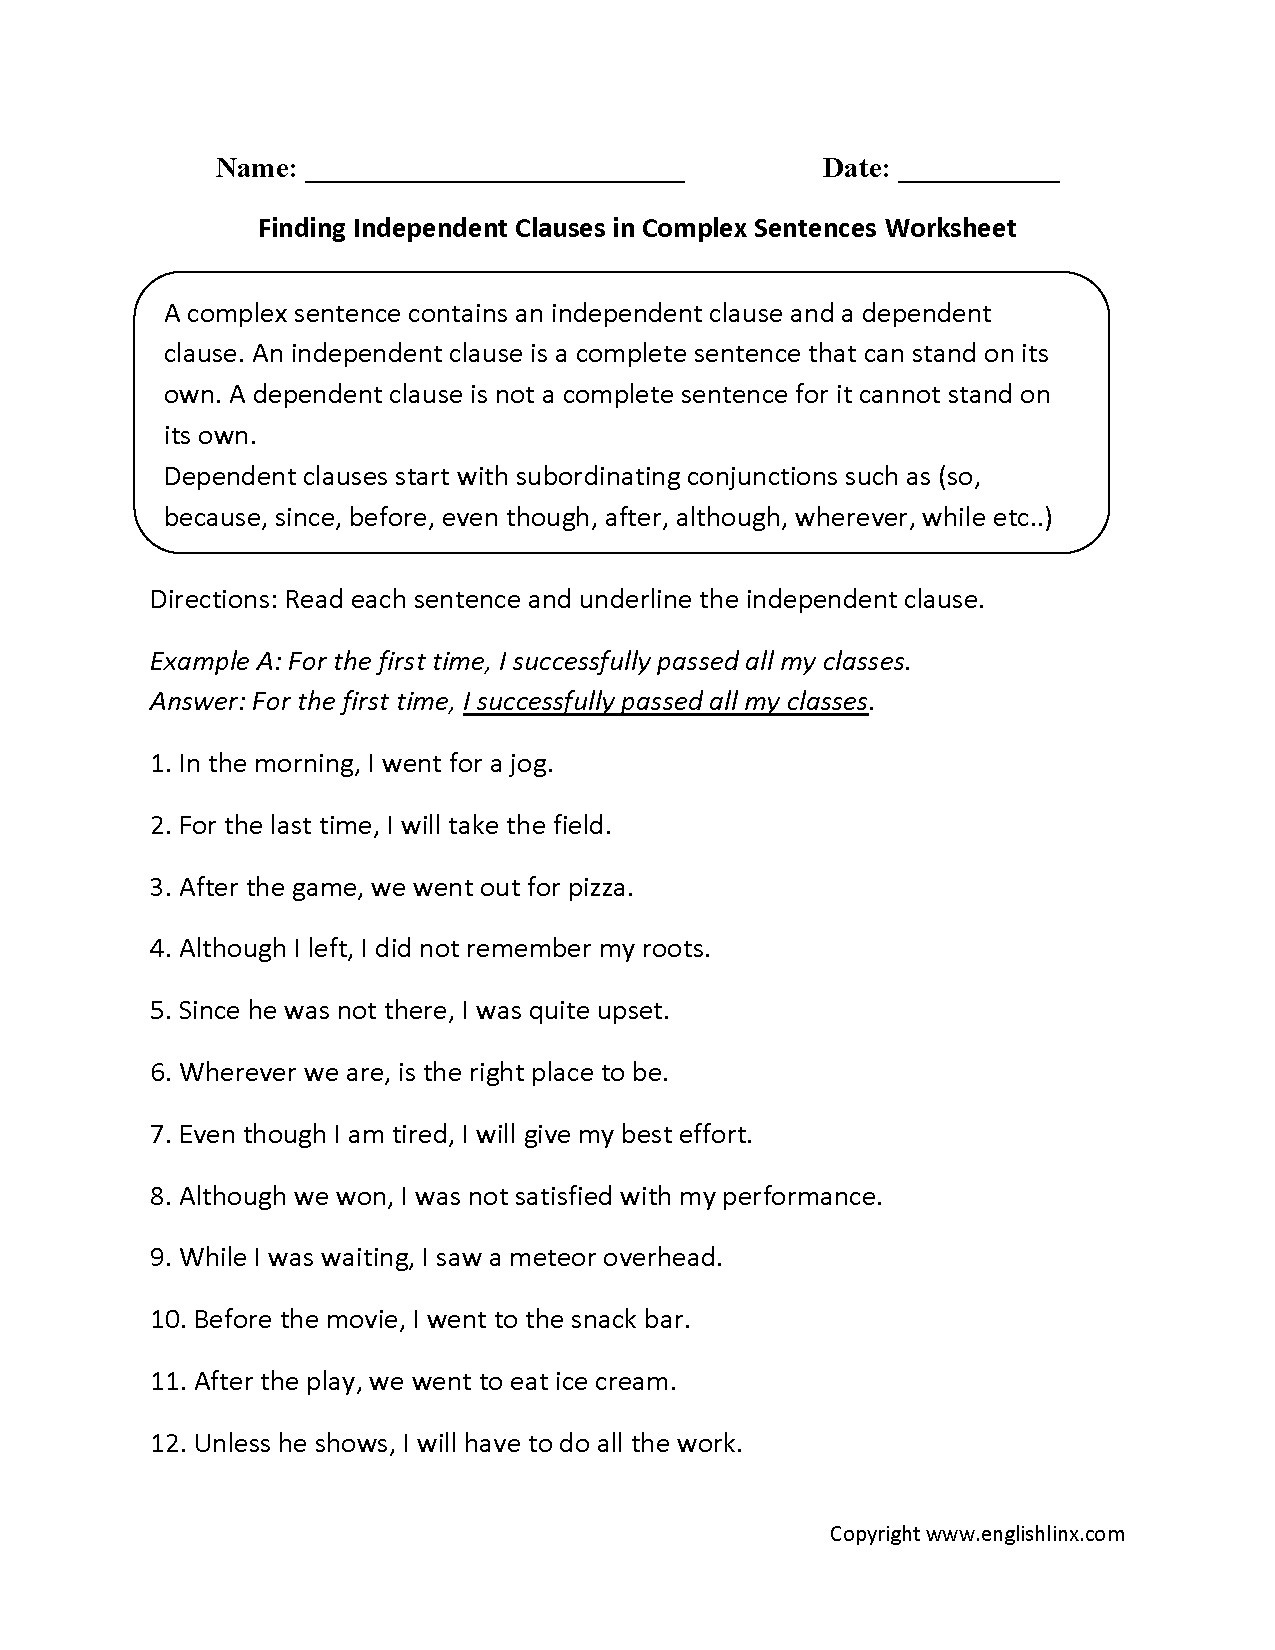 Sentences Worksheets | Complex Sentences Worksheets - Free Printable Worksheets On Simple Compound And Complex Sentences